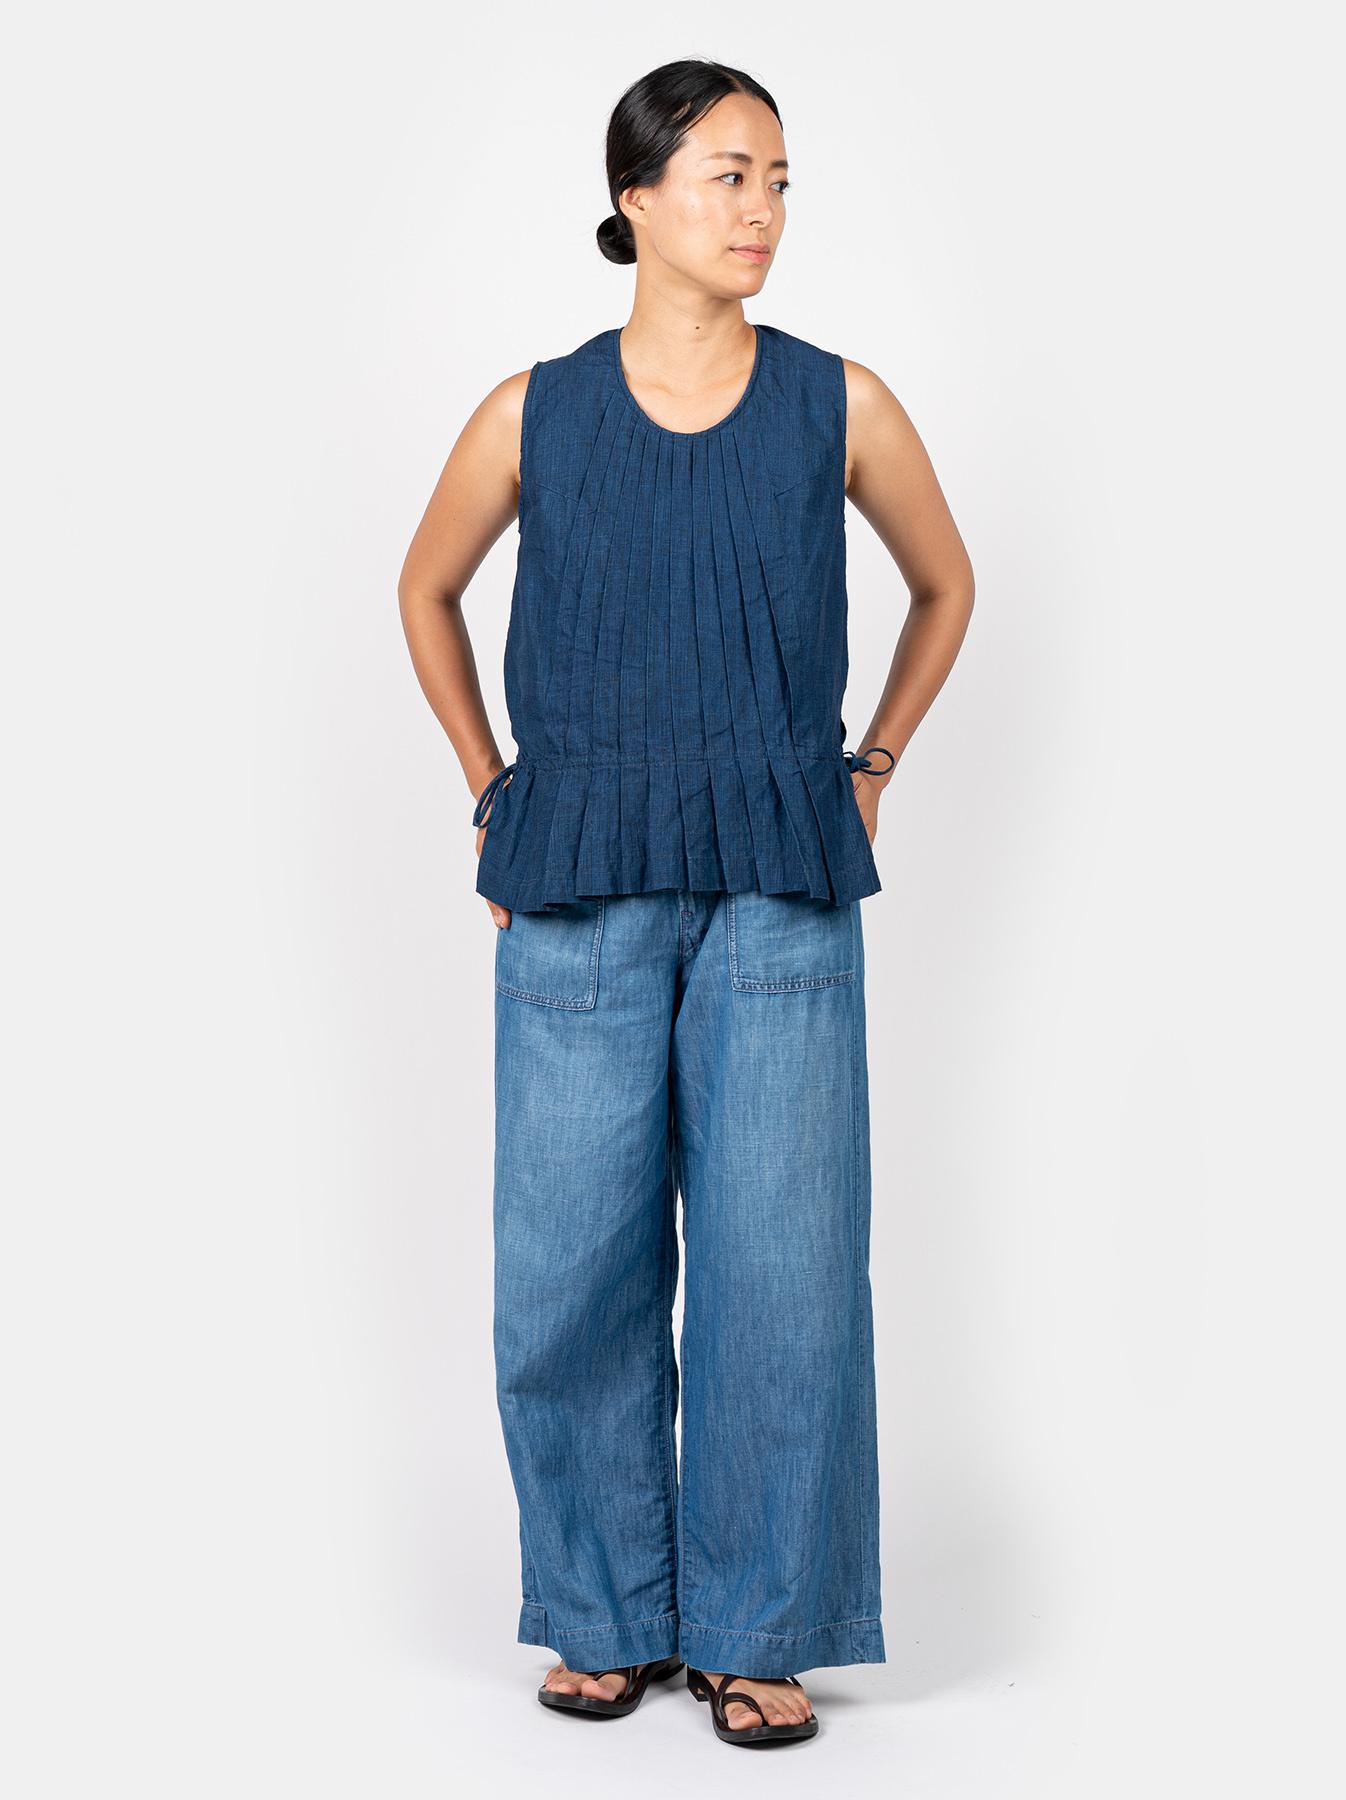 WH Indigo Linen Sleeveless Tuck Blouse-5